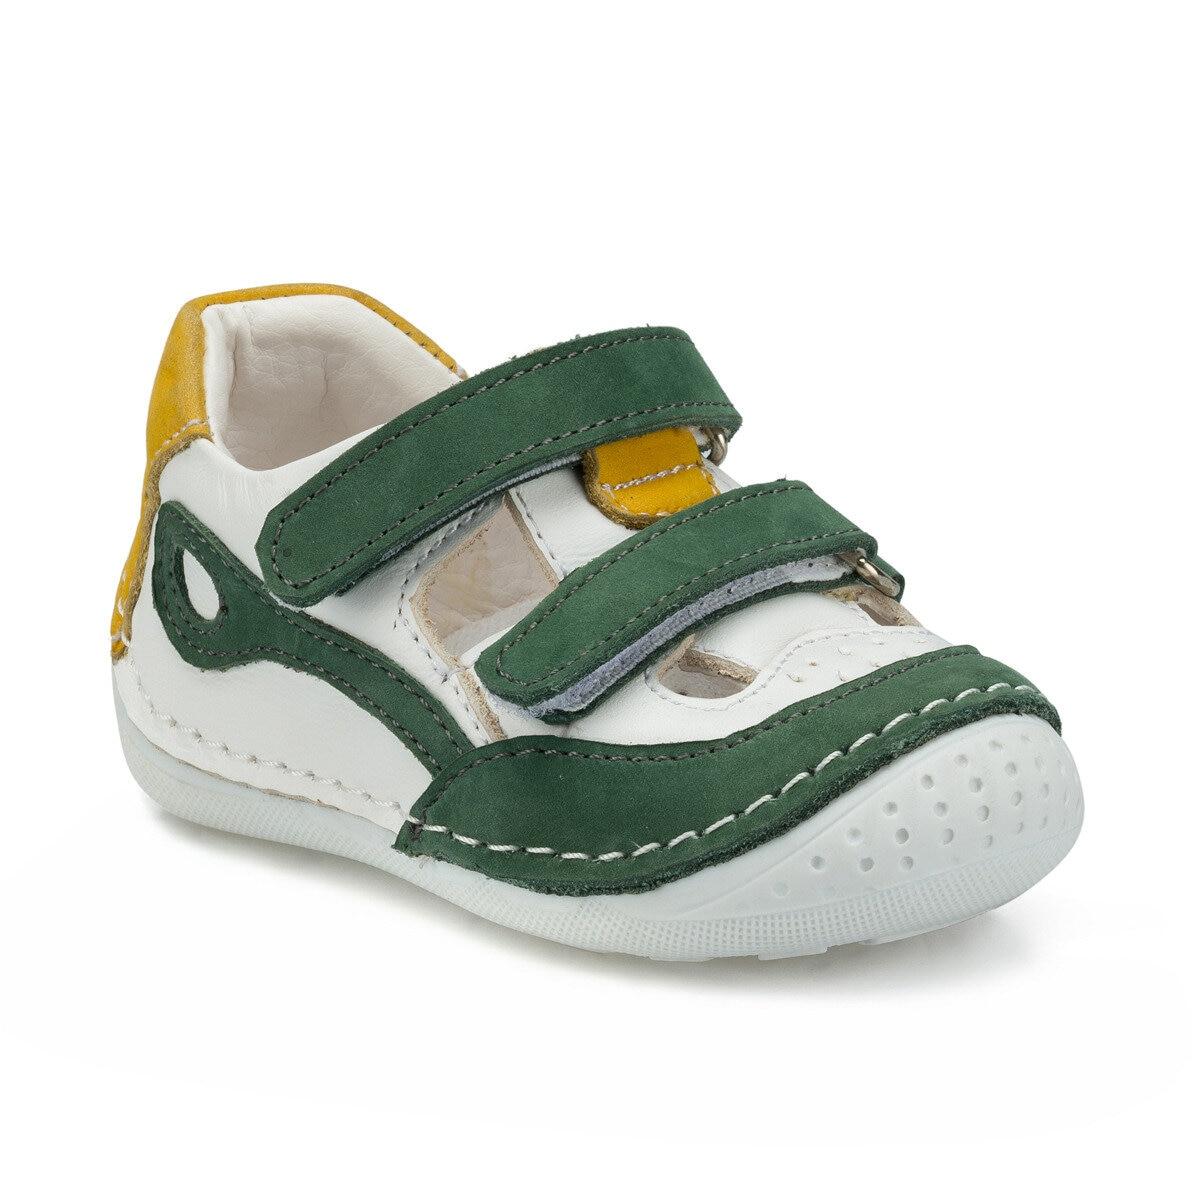 FLO 512207.I Green Male Child Sneaker Shoes Polaris